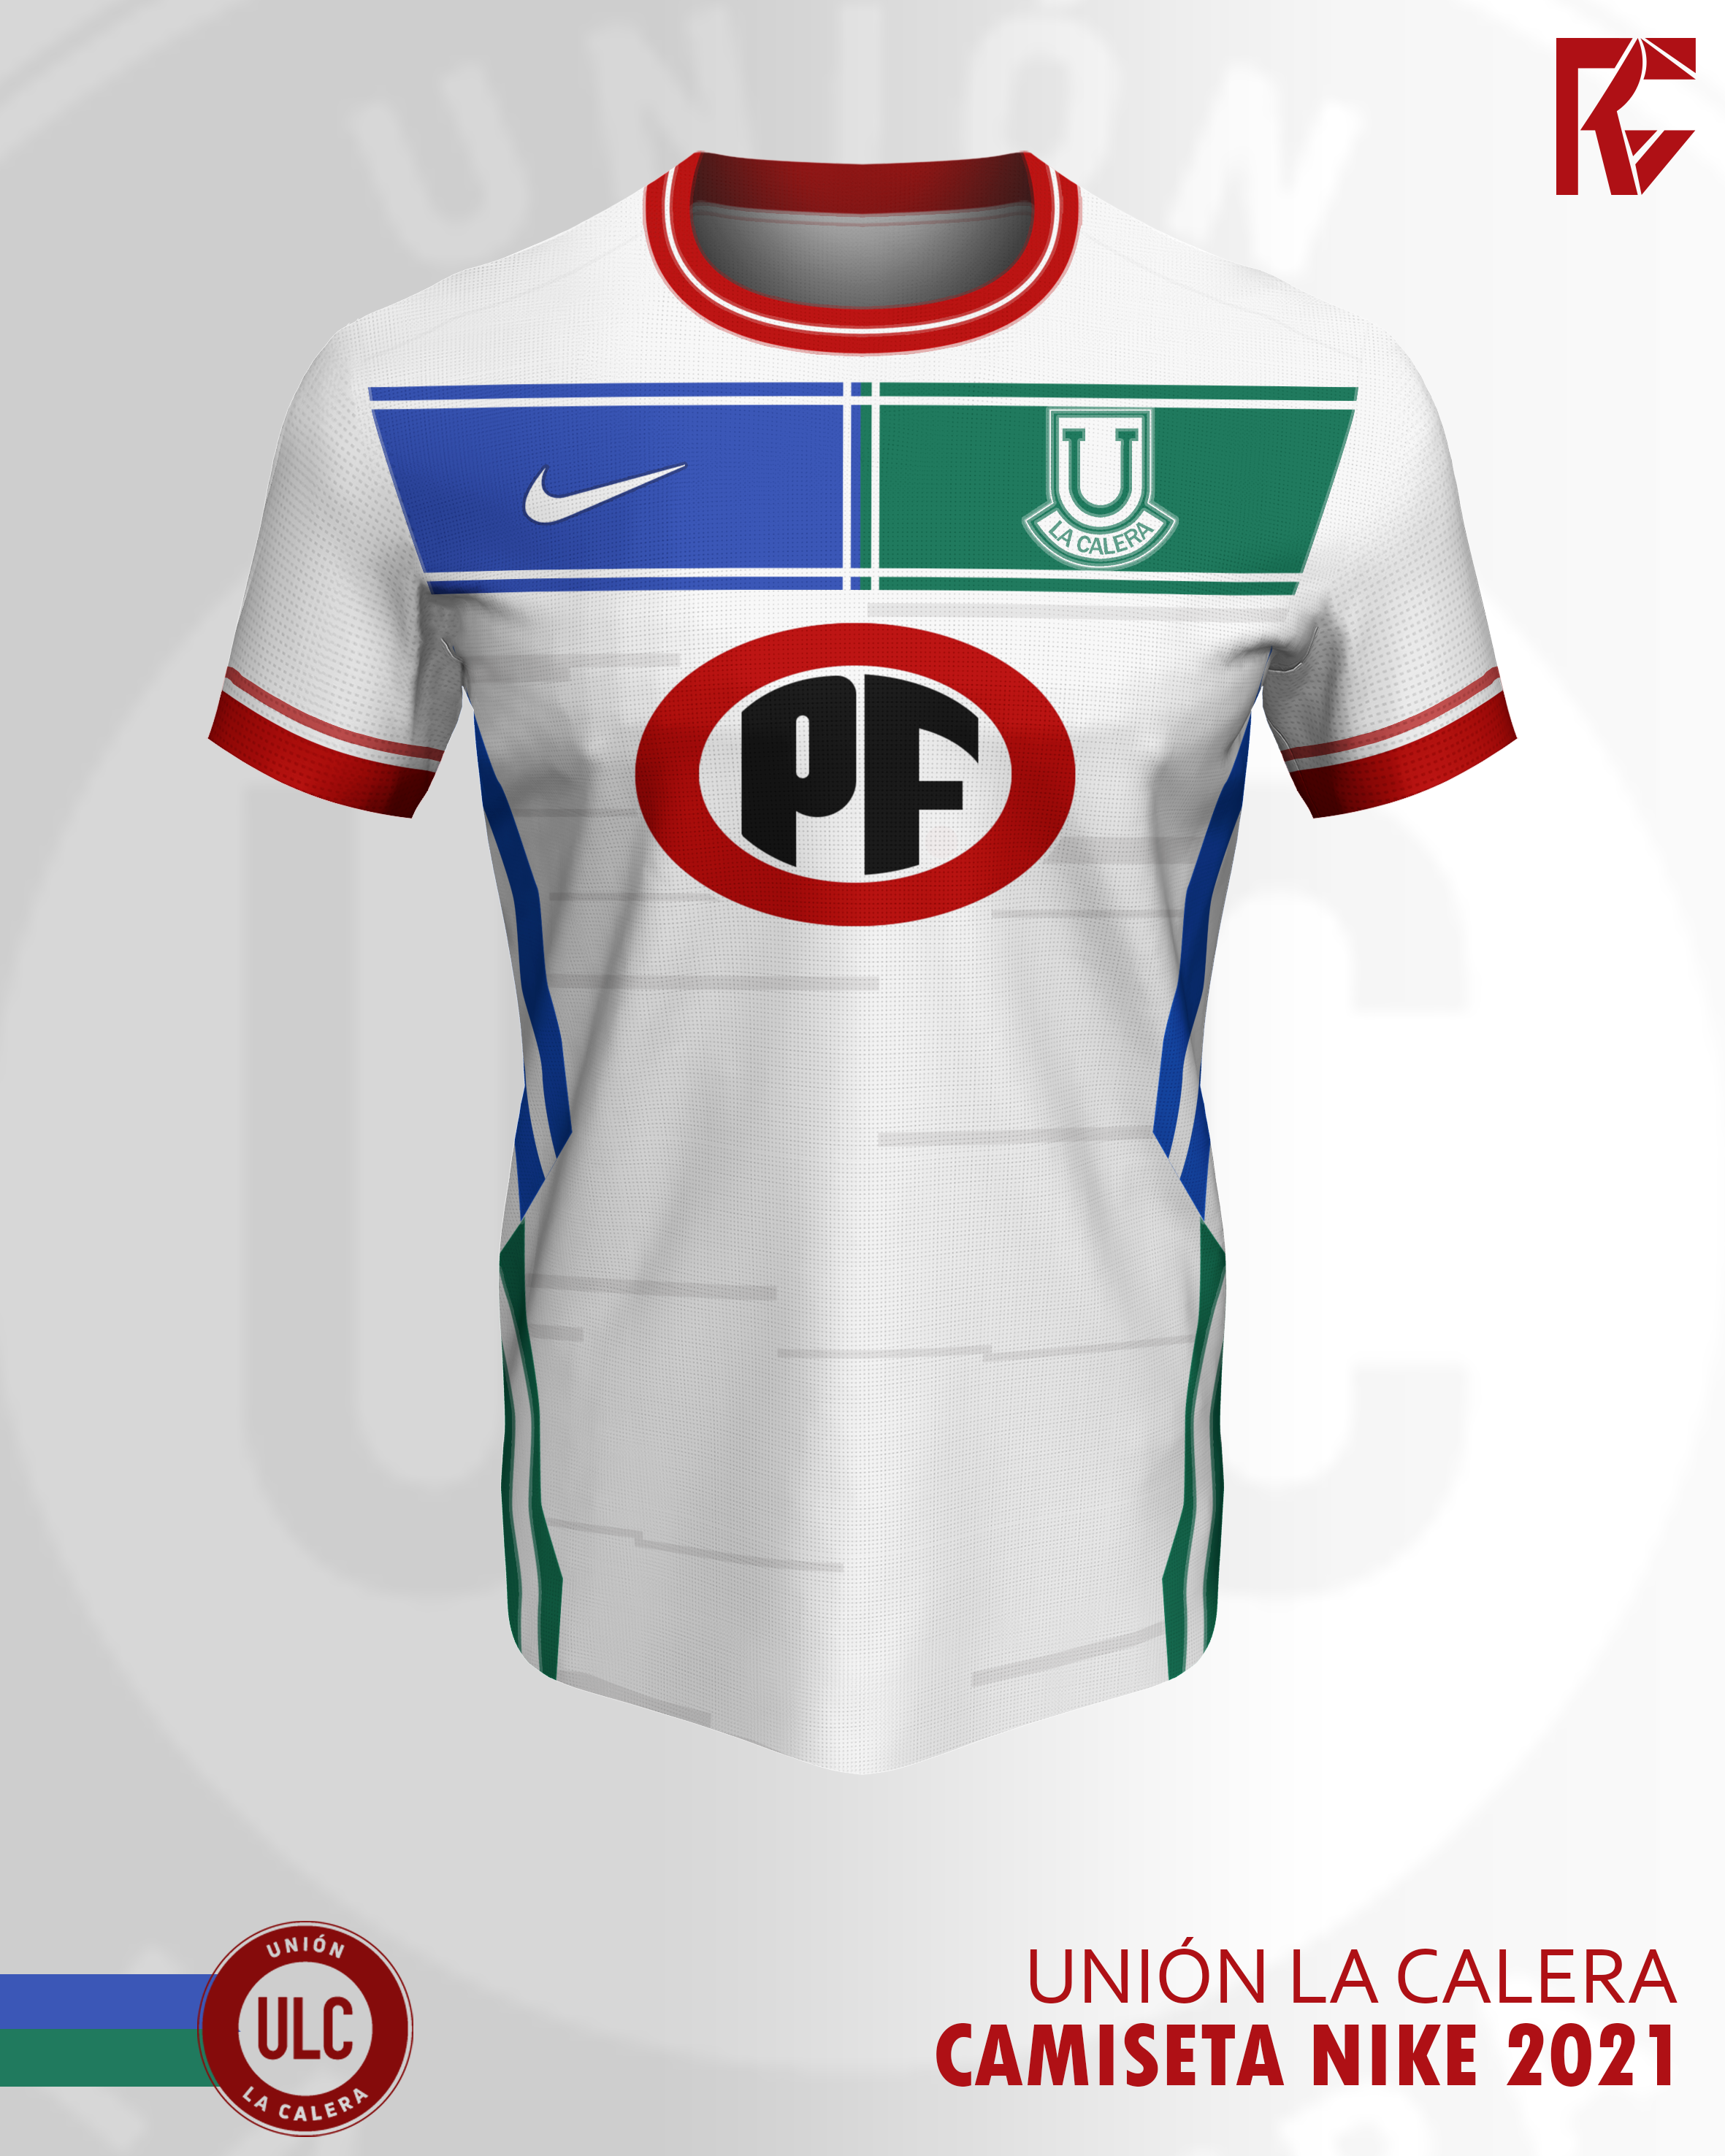 Concepto Ii Union La Calera X Nike Camiseta Visita 2021